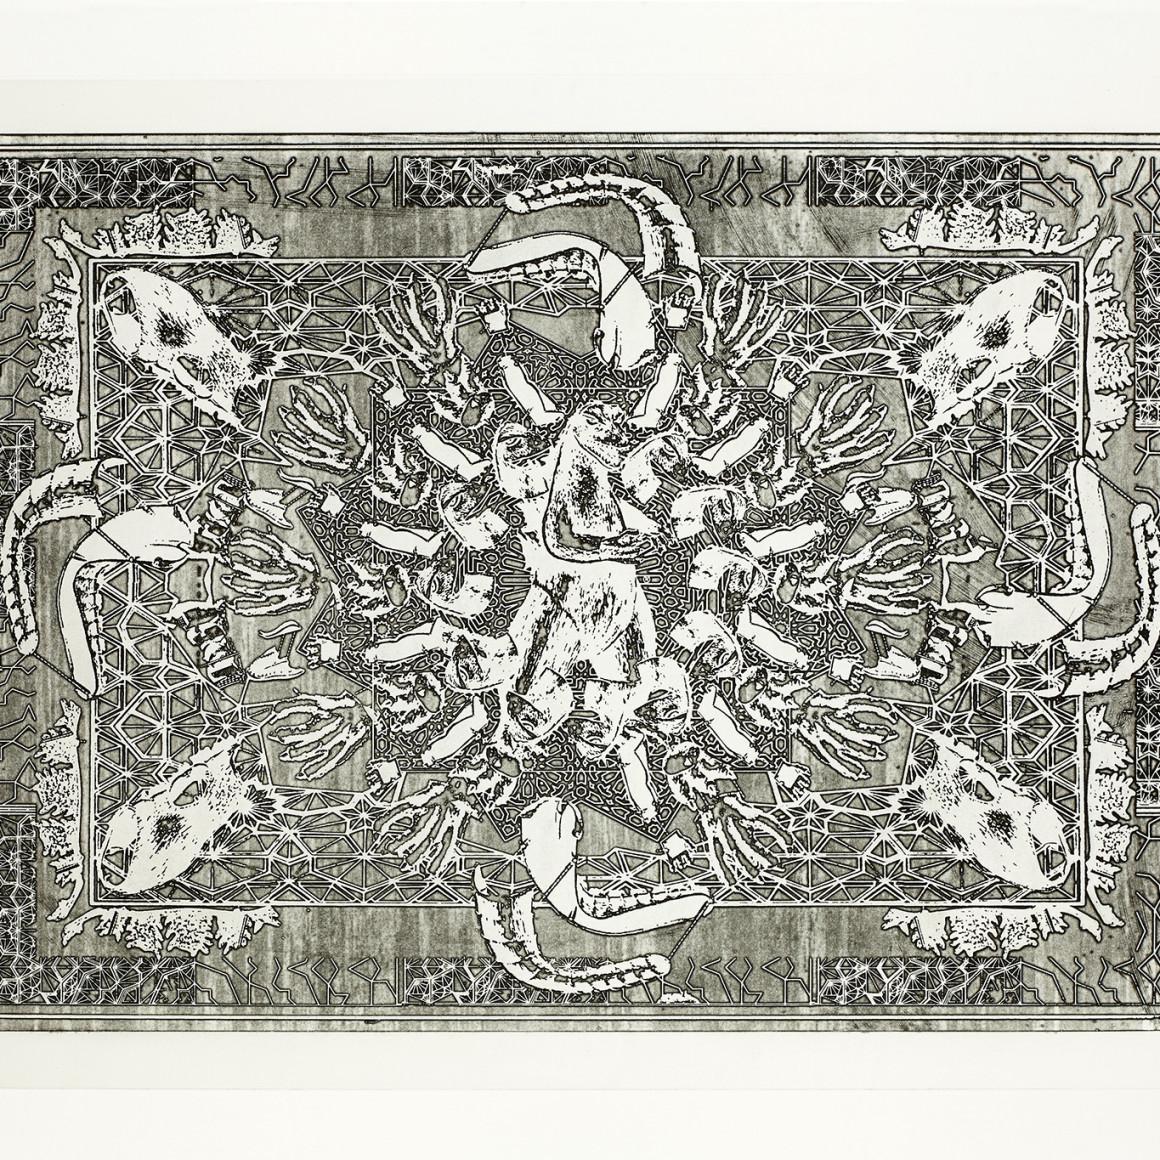 Zhivago Duncan, Imaginary Transcendence, 2014-15